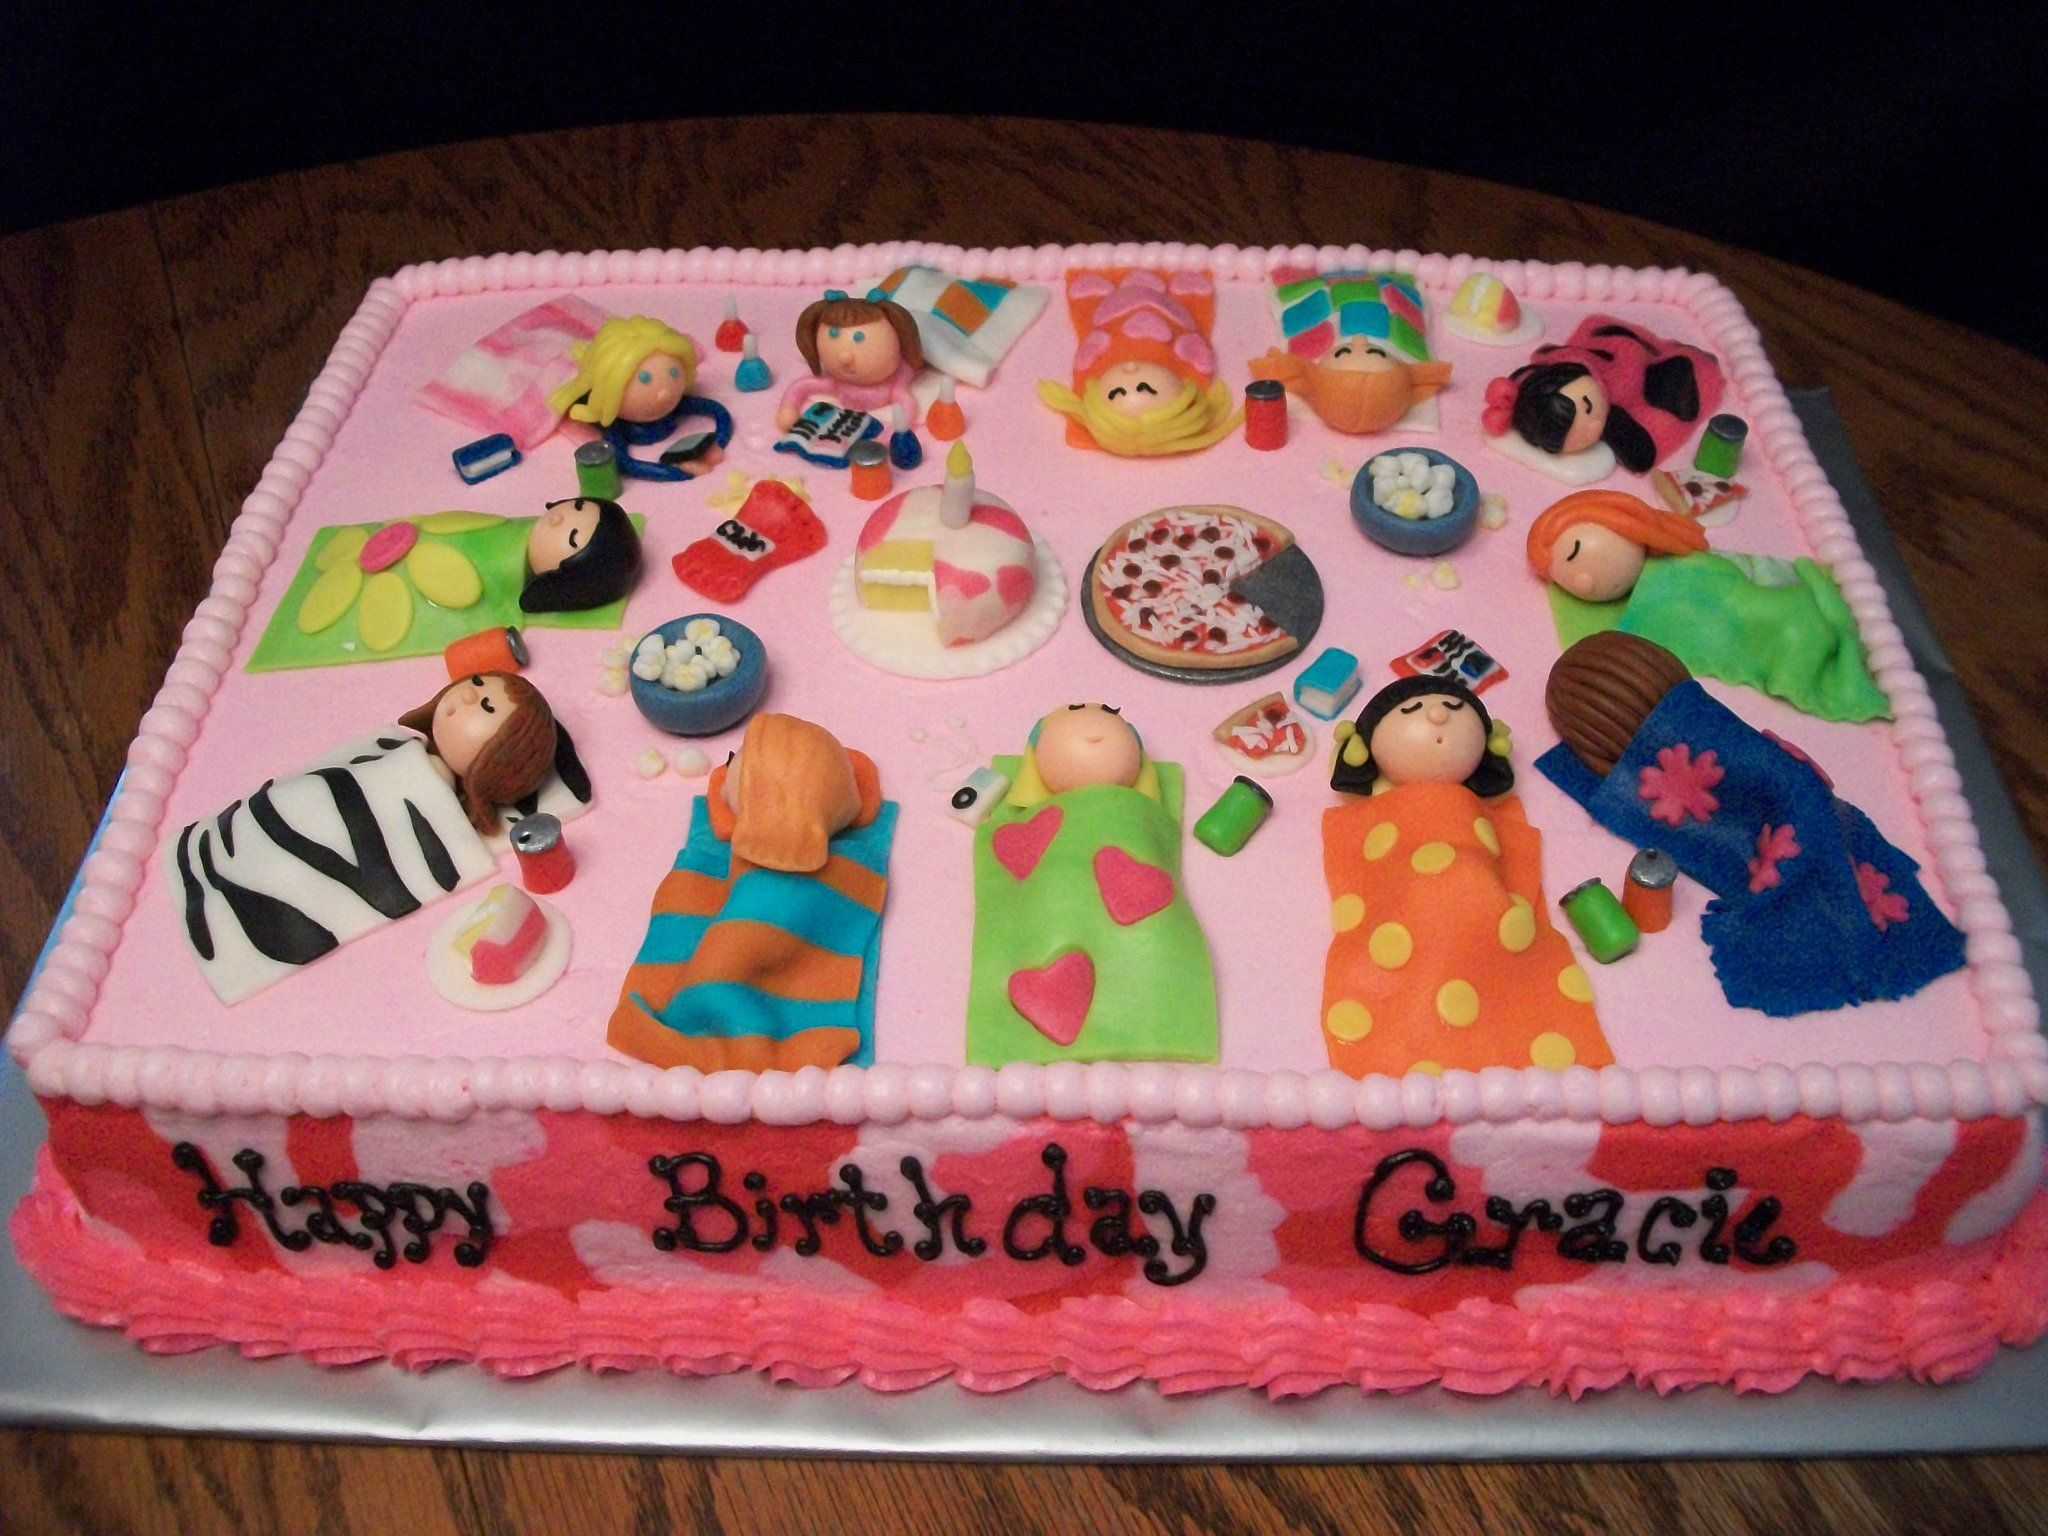 Outstanding Slumber Party Cake Slumber Party Birthday Party Cakes Funny Birthday Cards Online Inifodamsfinfo